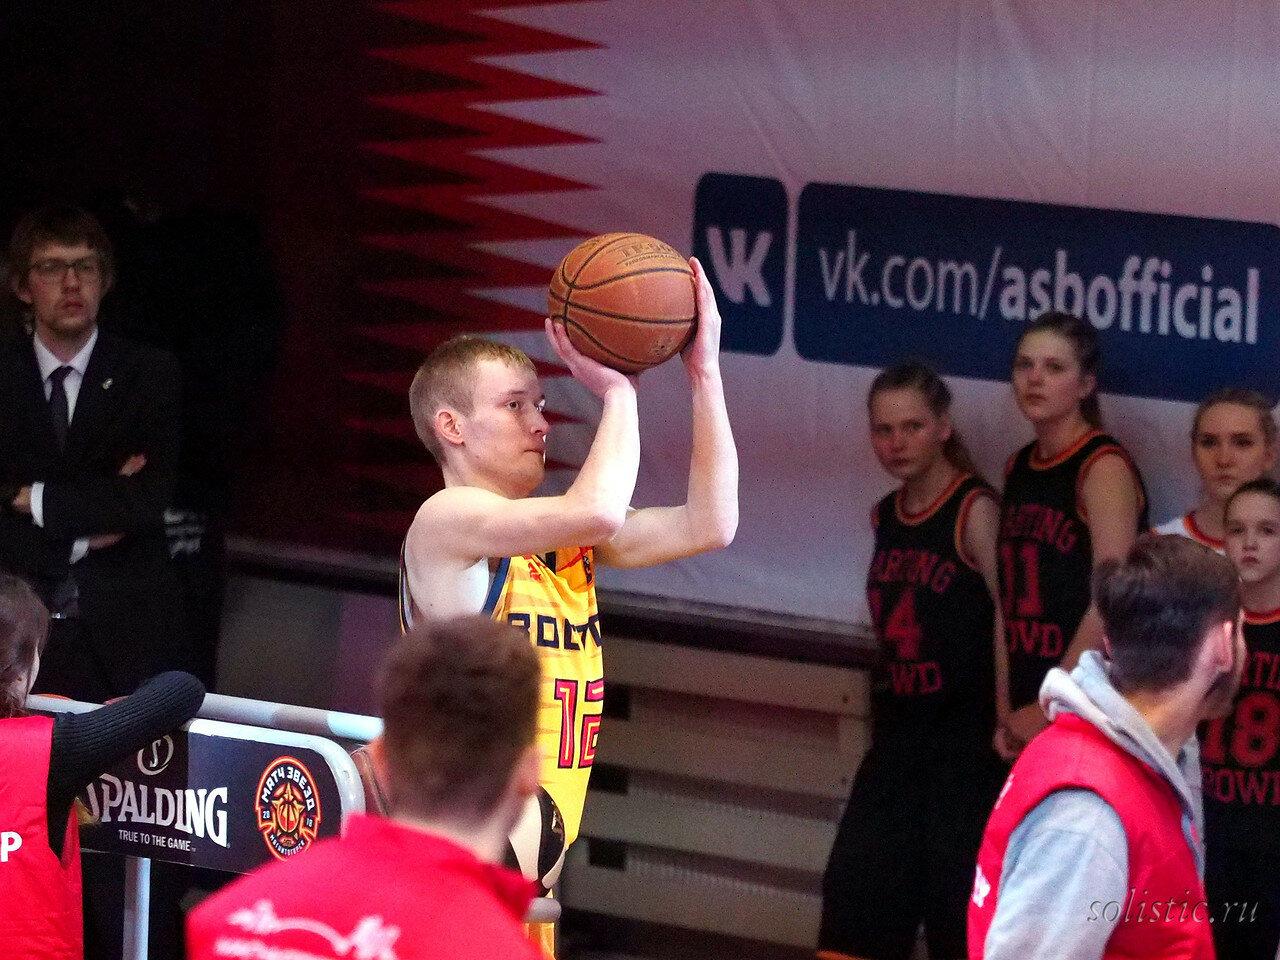 93 Матч звезд АСБ 2018 (ассоциации студенческого баскетбола)